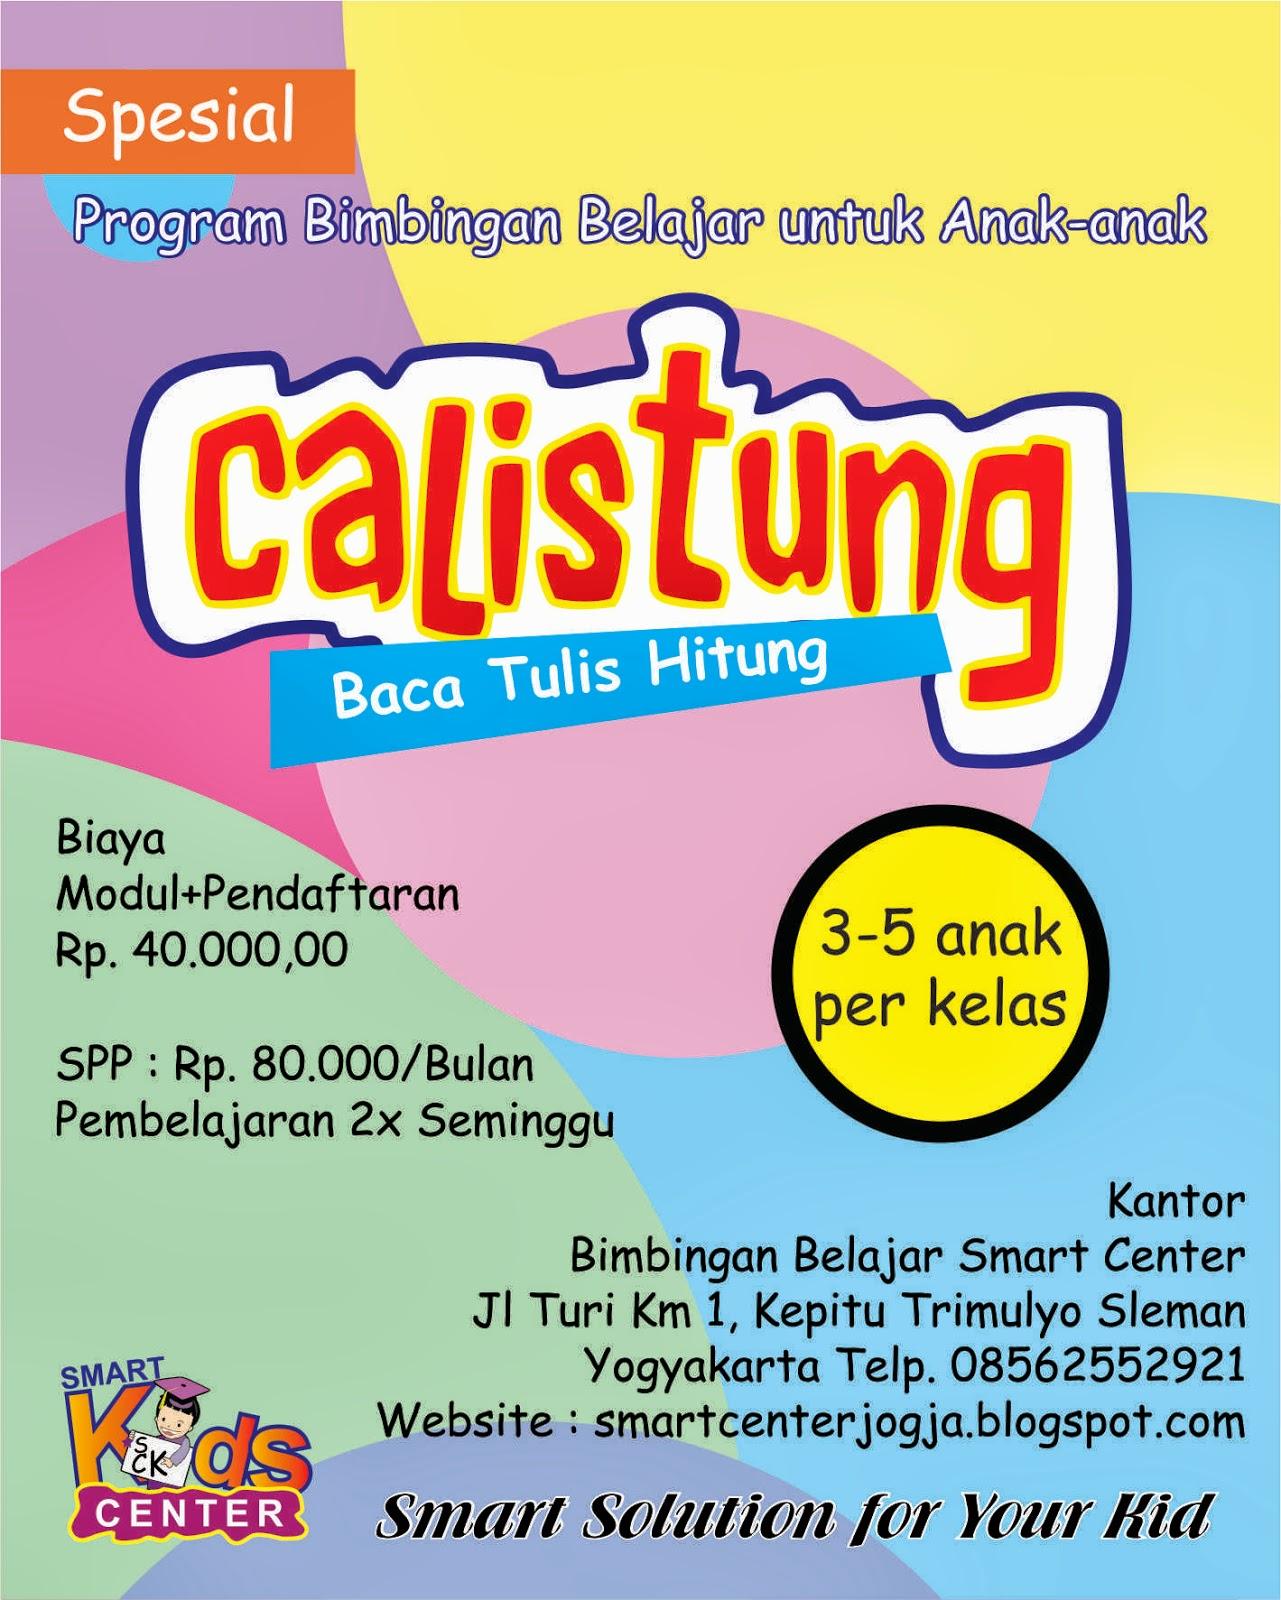 Smart Center Yogyakarta Les Calistung Smart Center